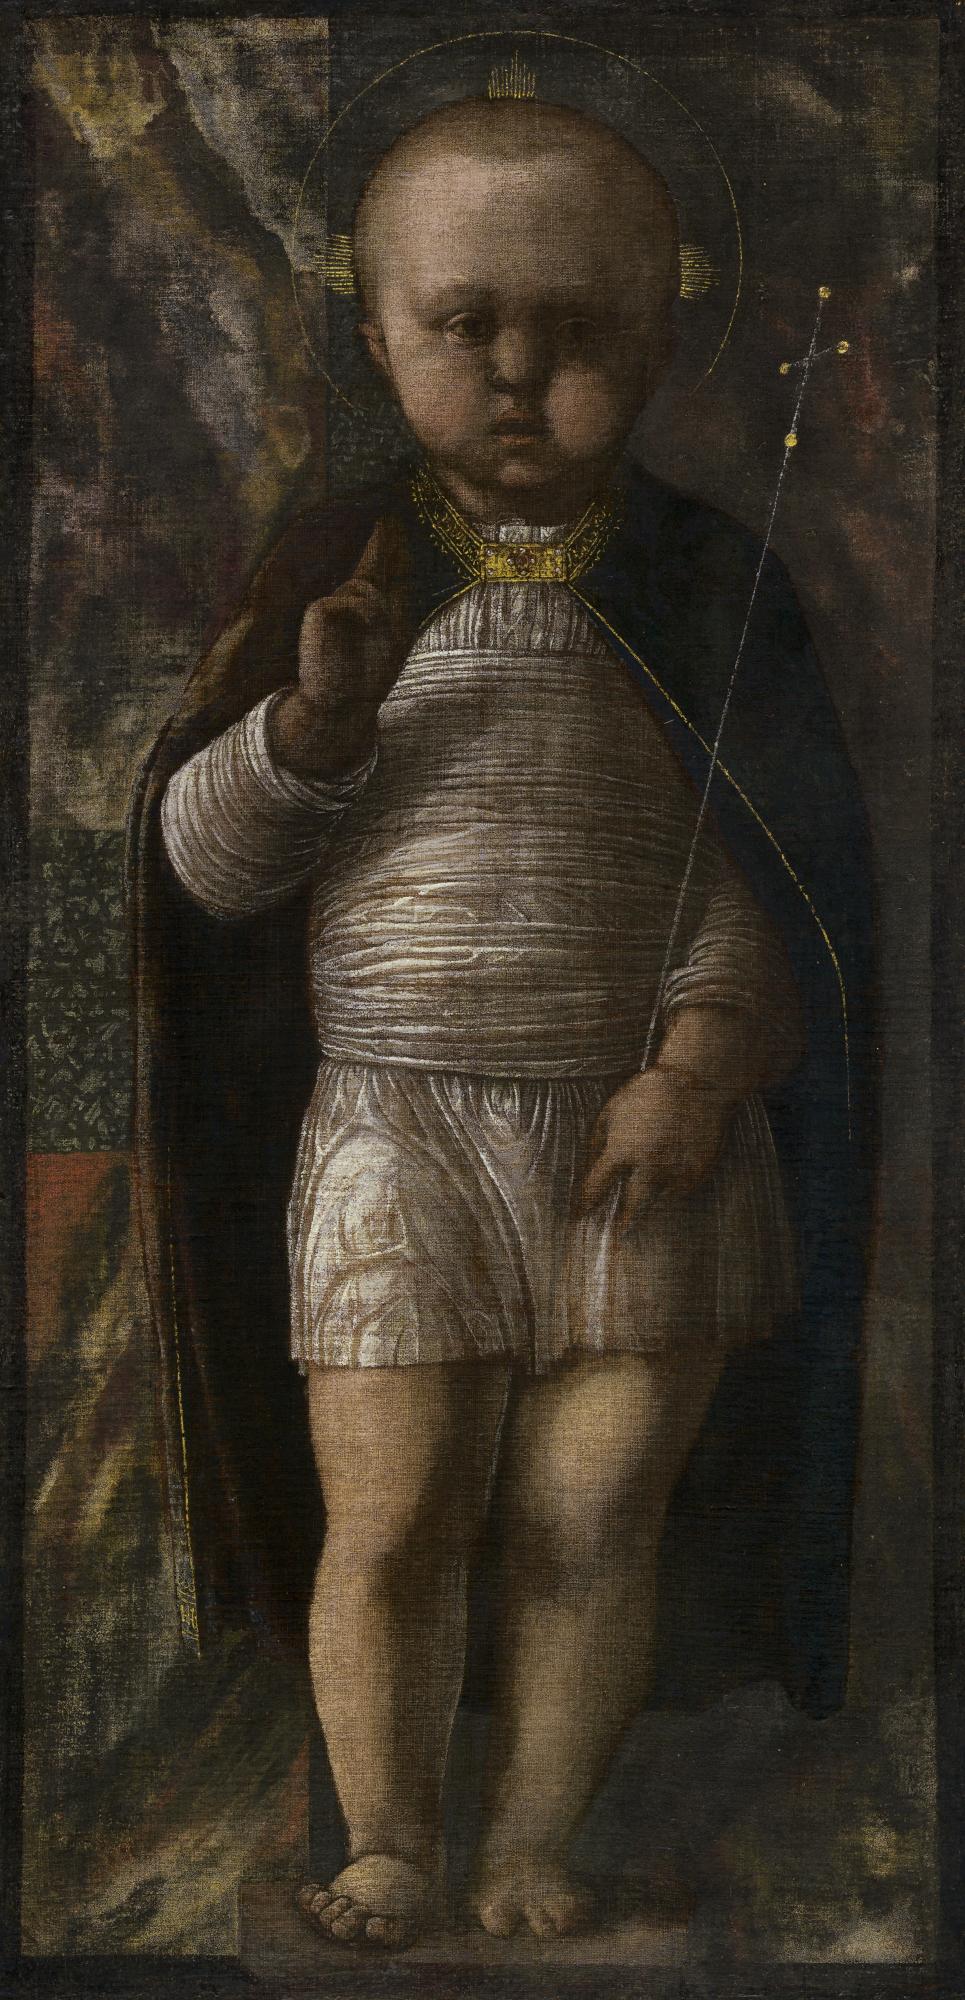 The Infant Savior by Andrea Mantegna